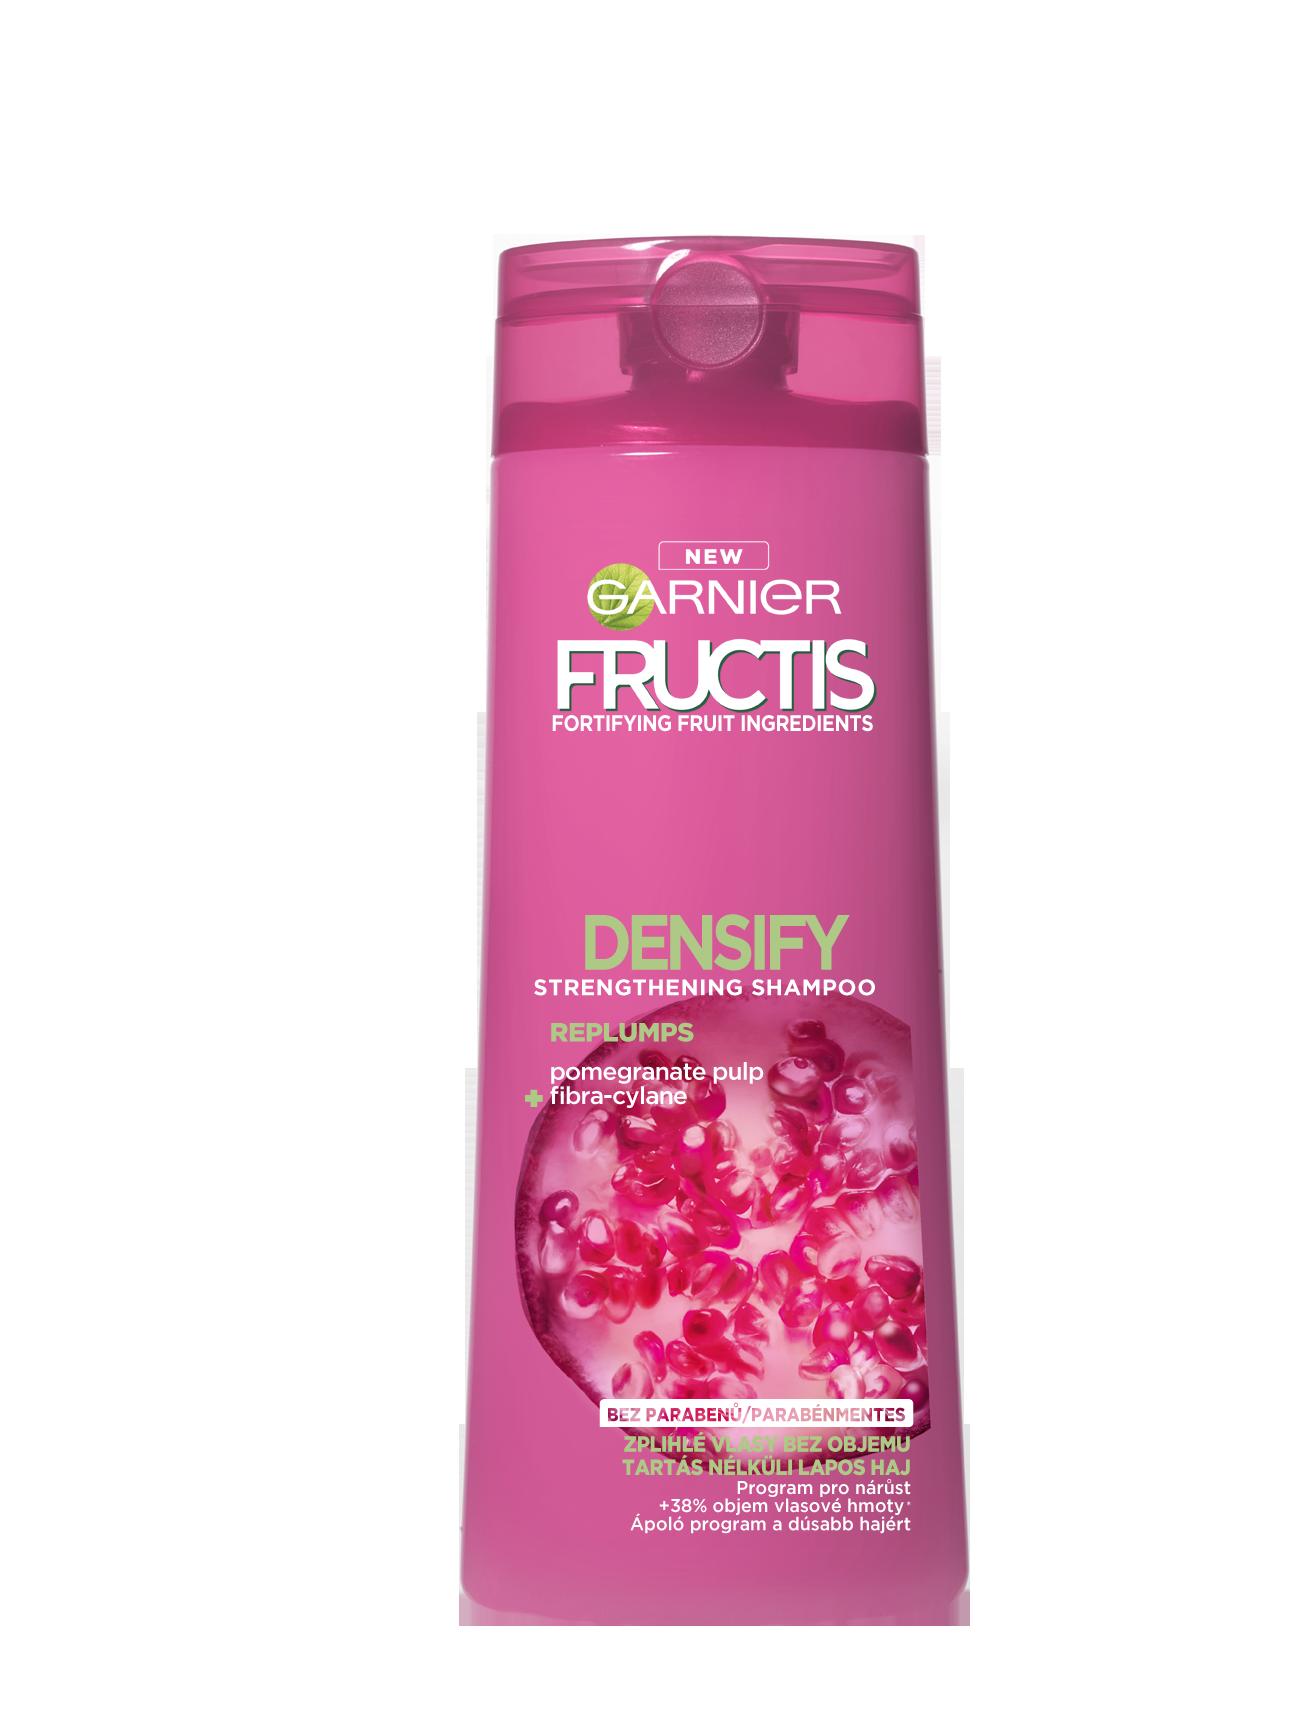 Garnier Fructis Densify posilující šampon 400 ml